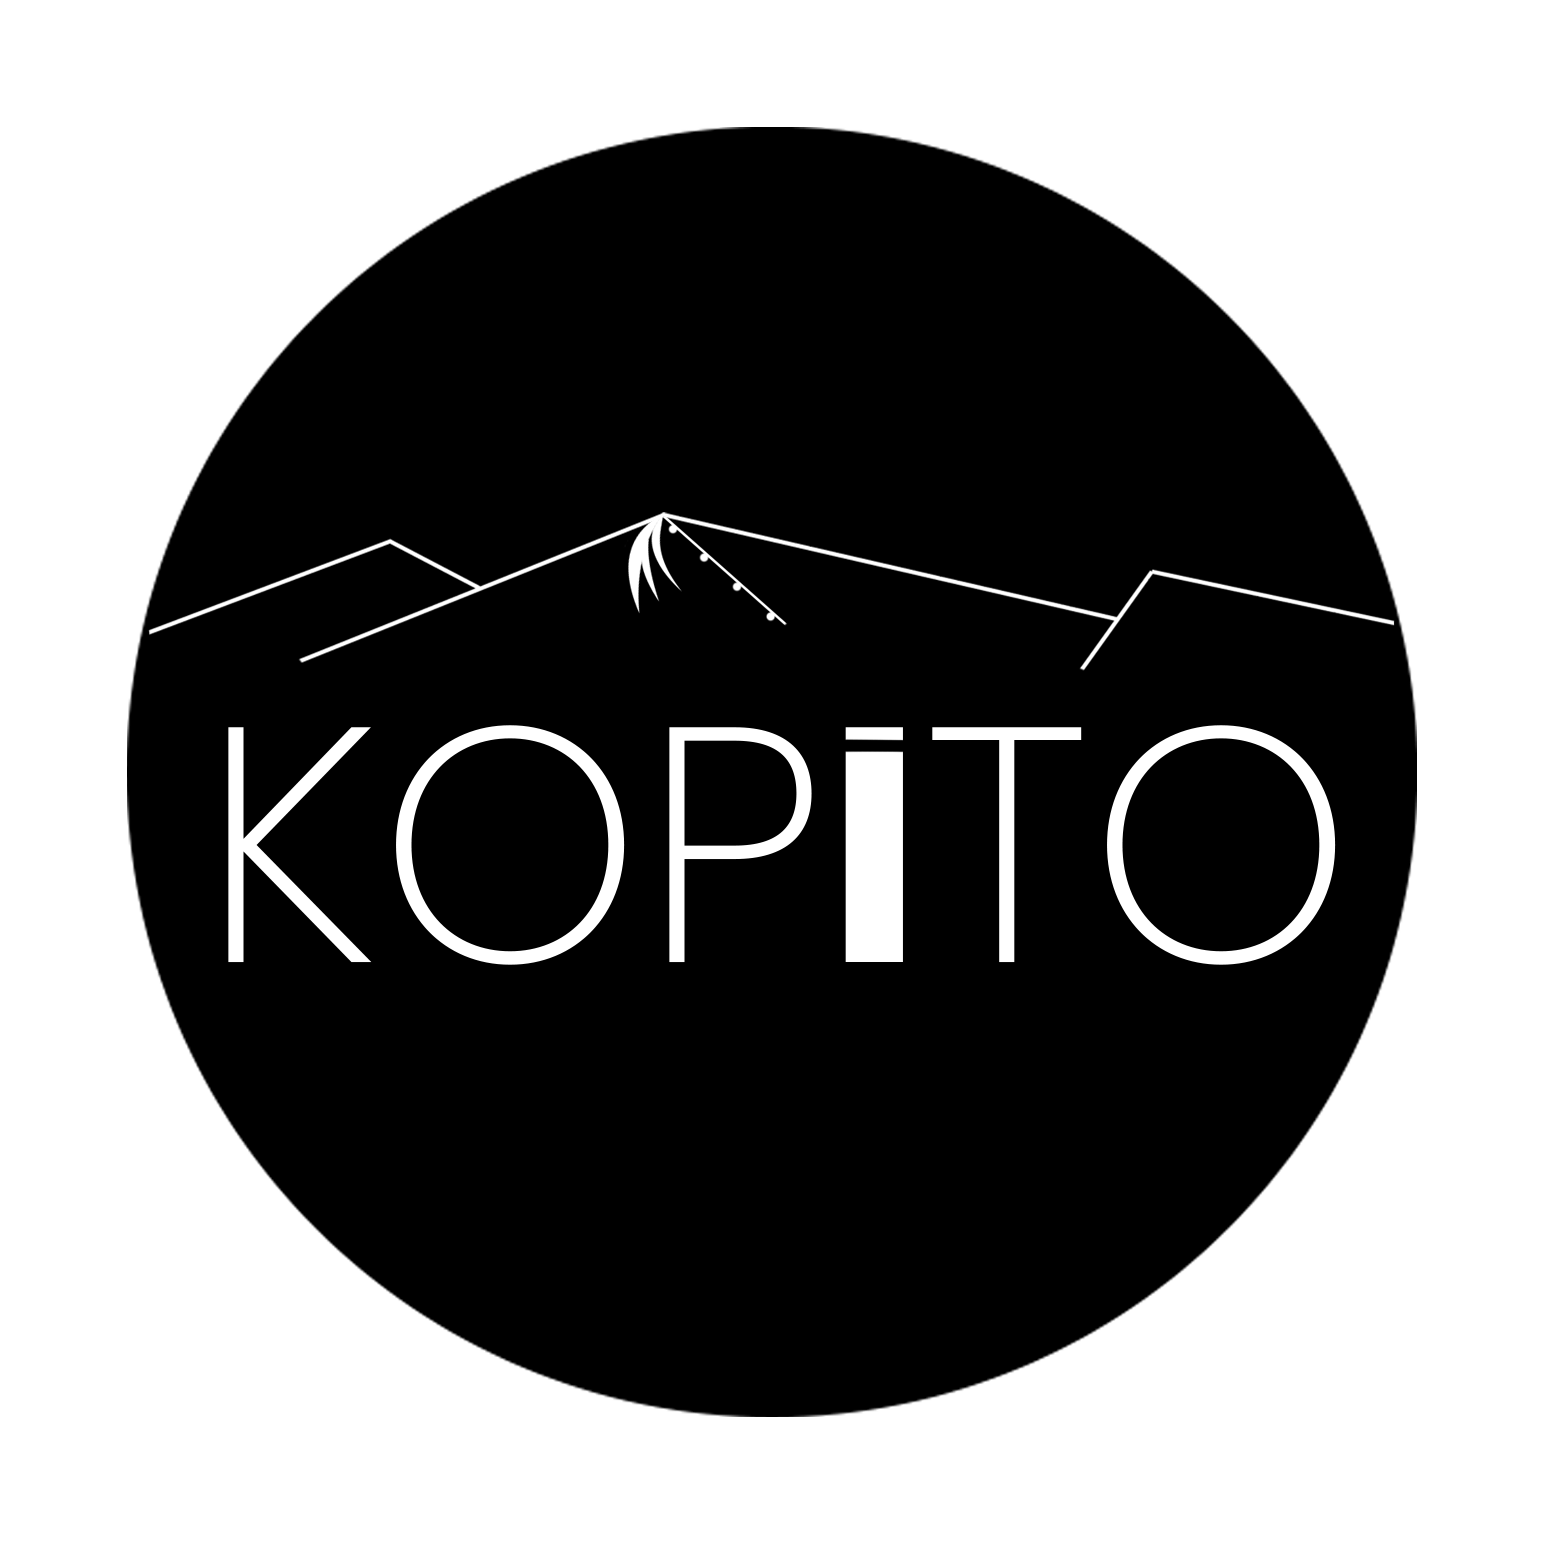 Kopito.cz